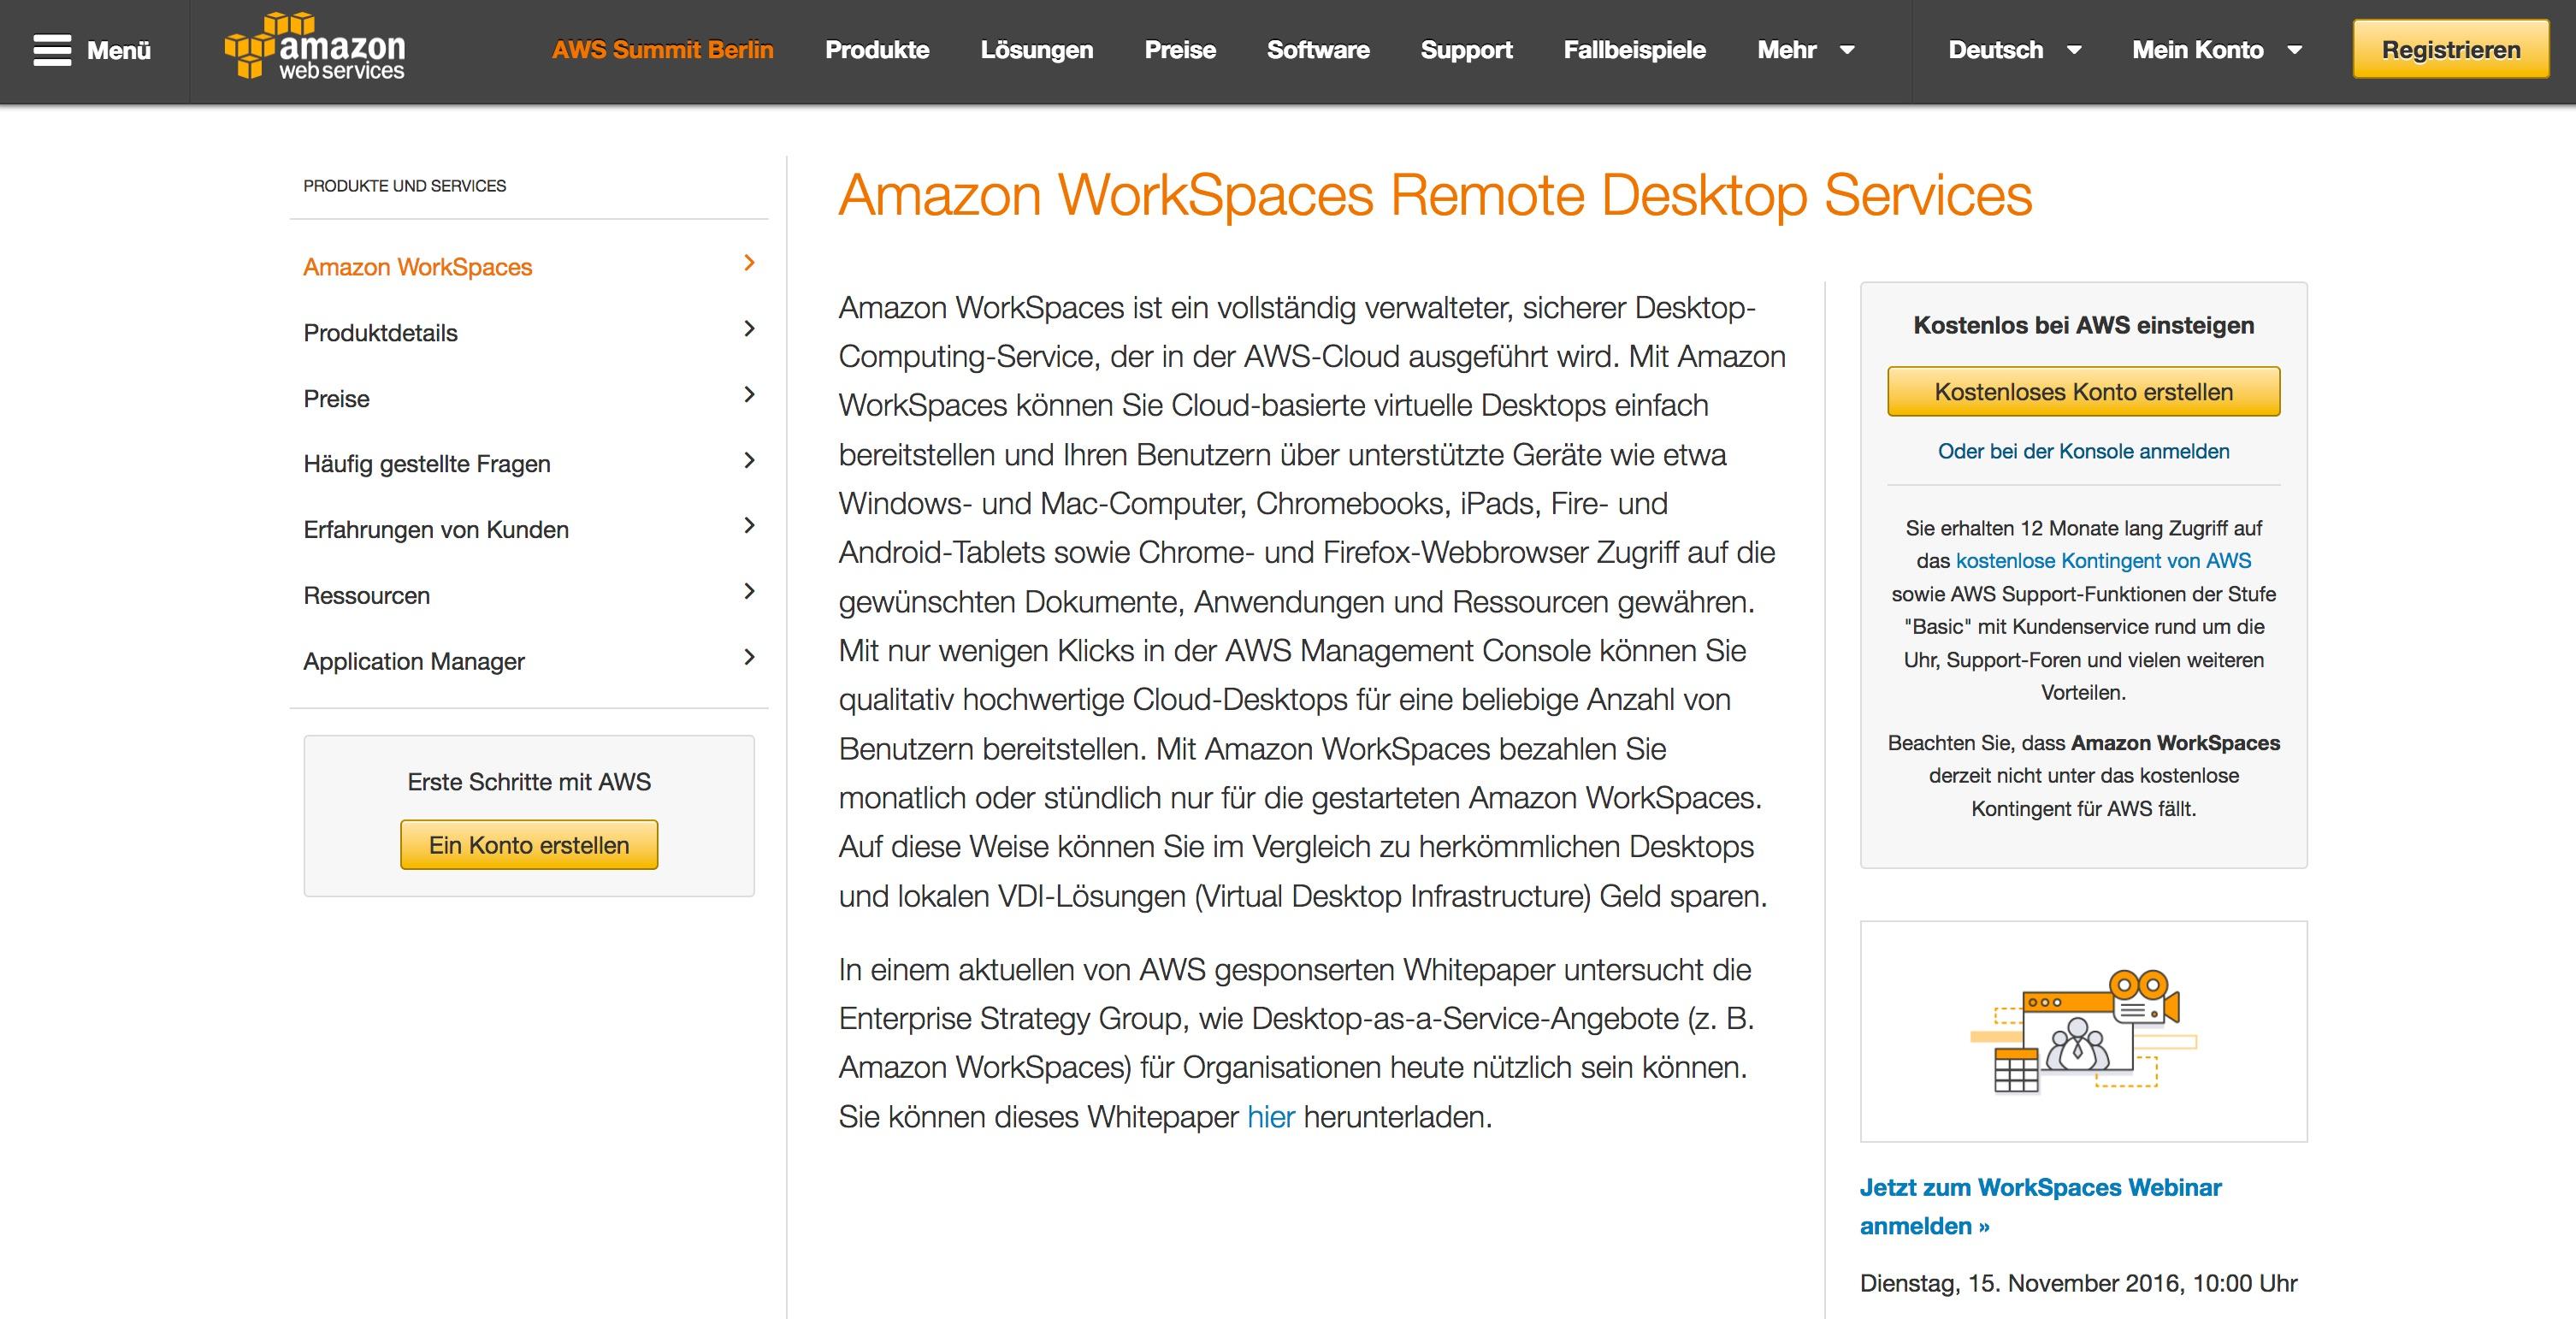 Amazon_WorkSpaces_-_Remote_Desktop_Services.jpg